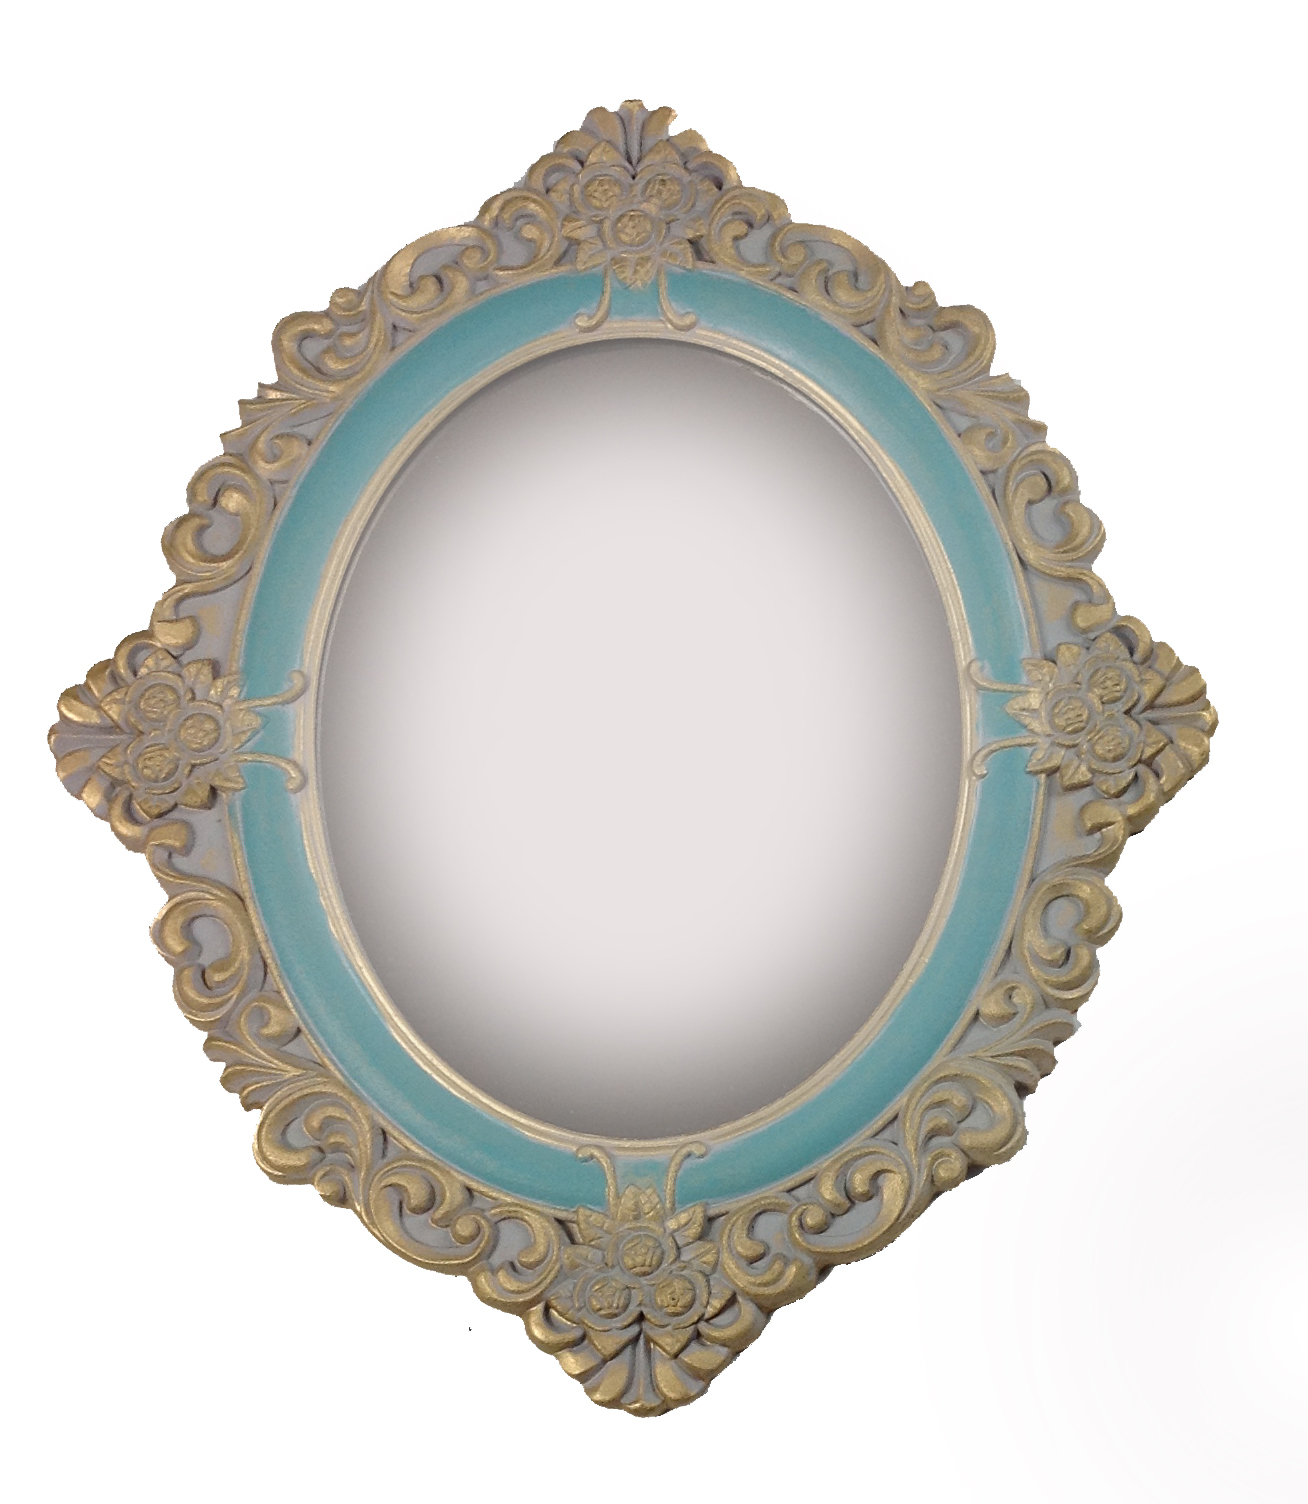 antik holz wandspiegel spiegel 59 cm garderobenspiegel flurspiegel barock gold ebay. Black Bedroom Furniture Sets. Home Design Ideas